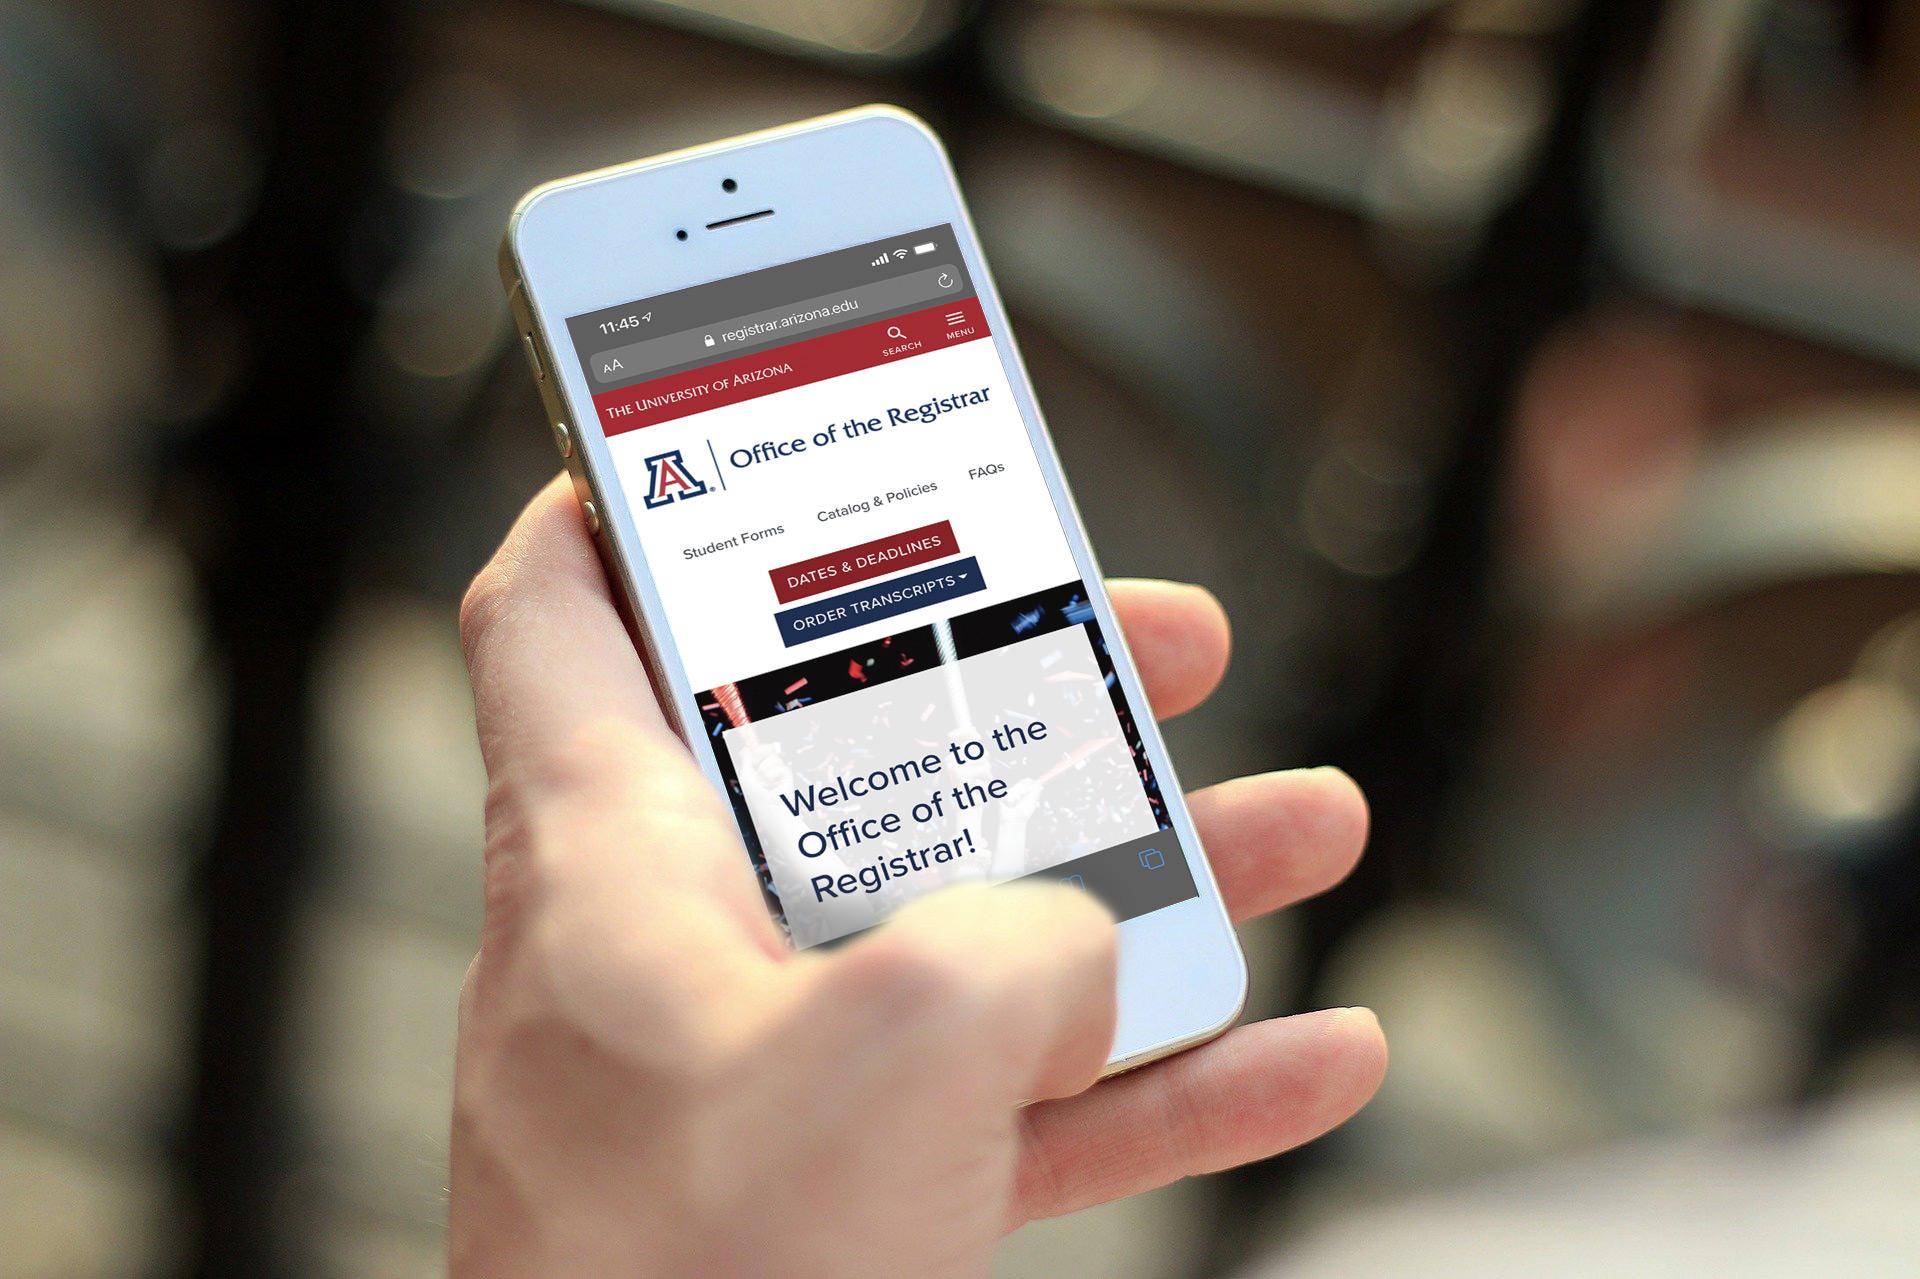 Mobile phone showing the Registrar website